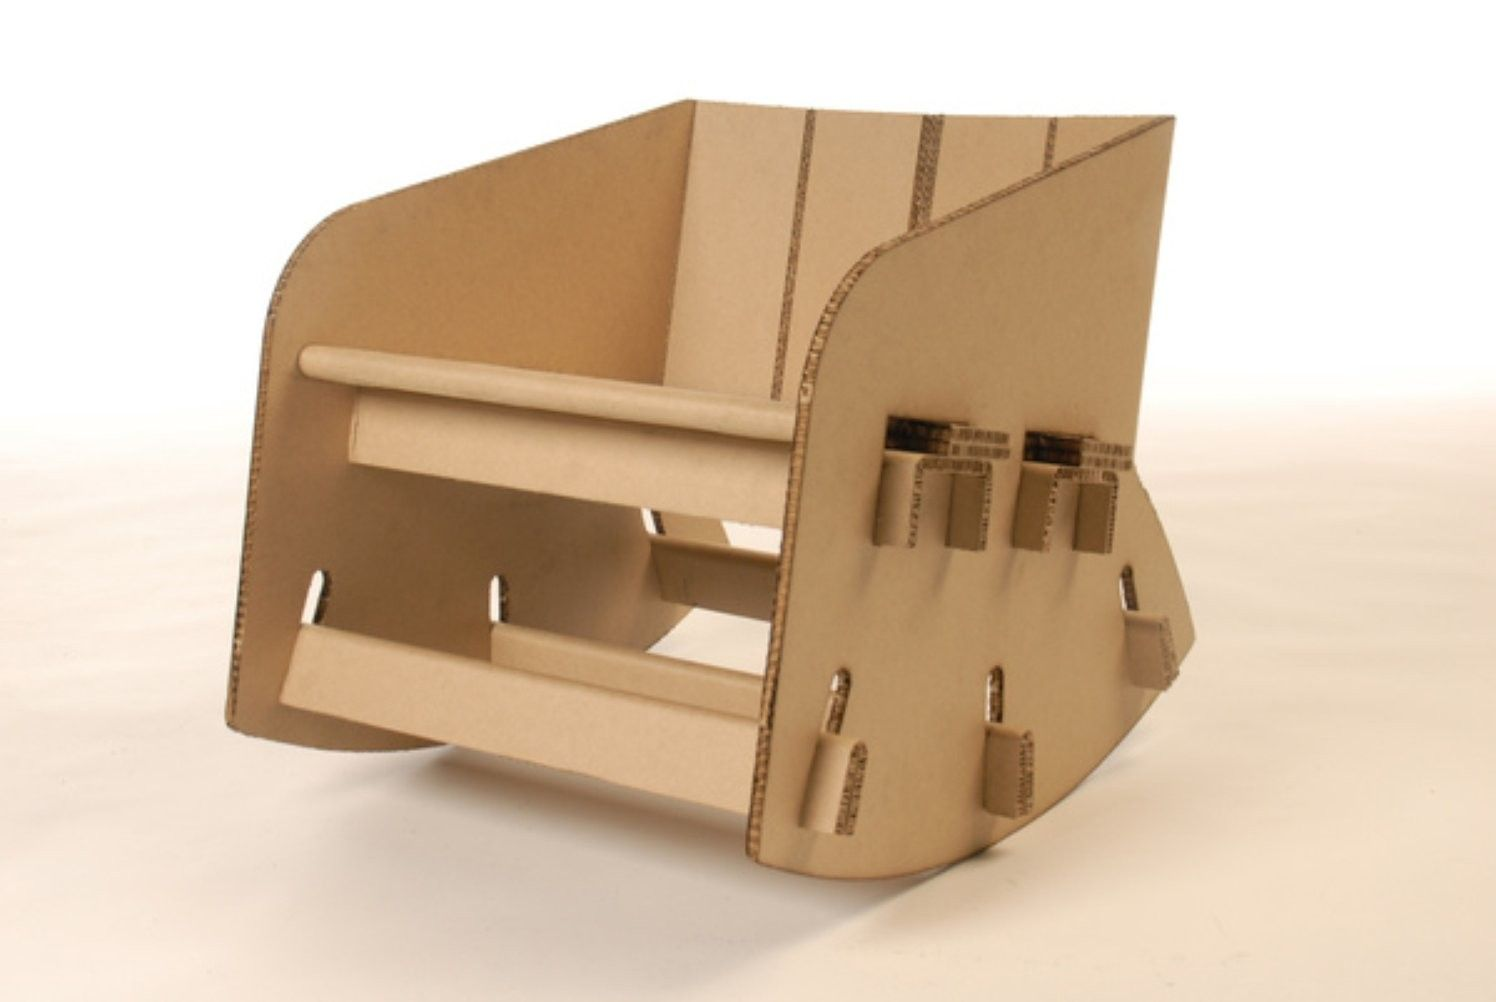 Furniture made of cardboard - a revolution in interior design 1